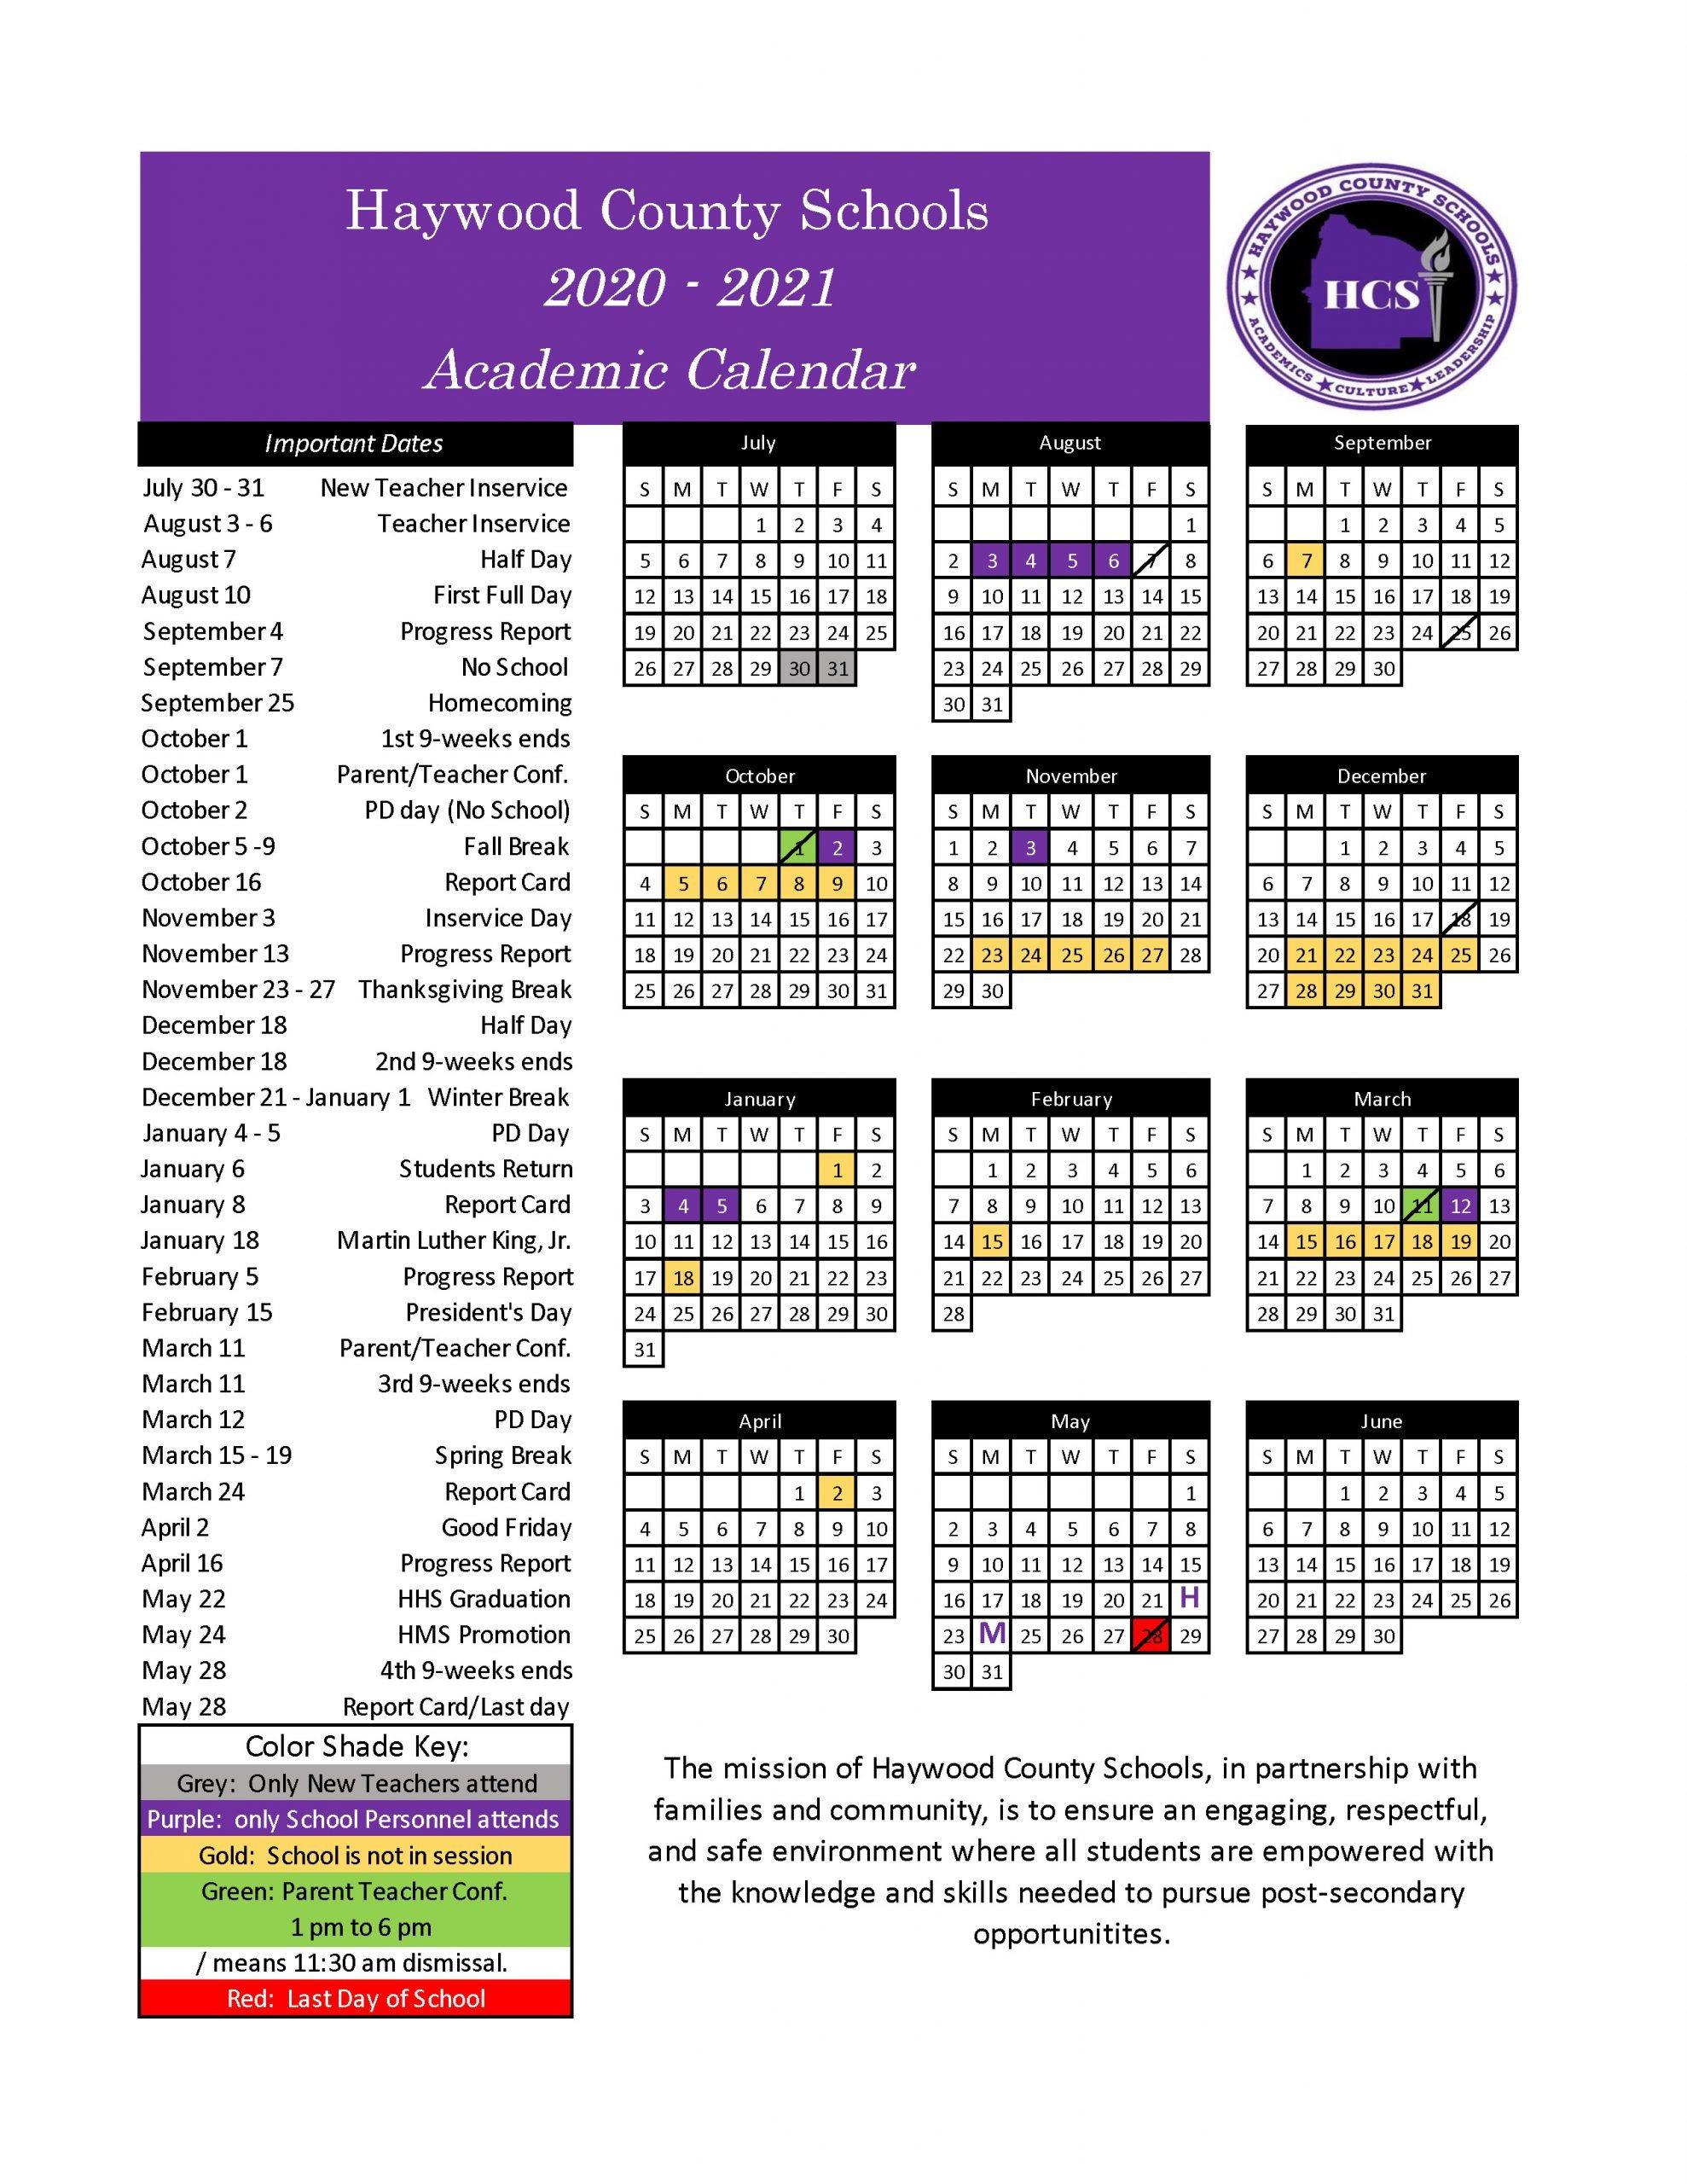 Hayward Unified School District Calendar 2021   Printable Inside Las Cruces Public School Calendar 2021